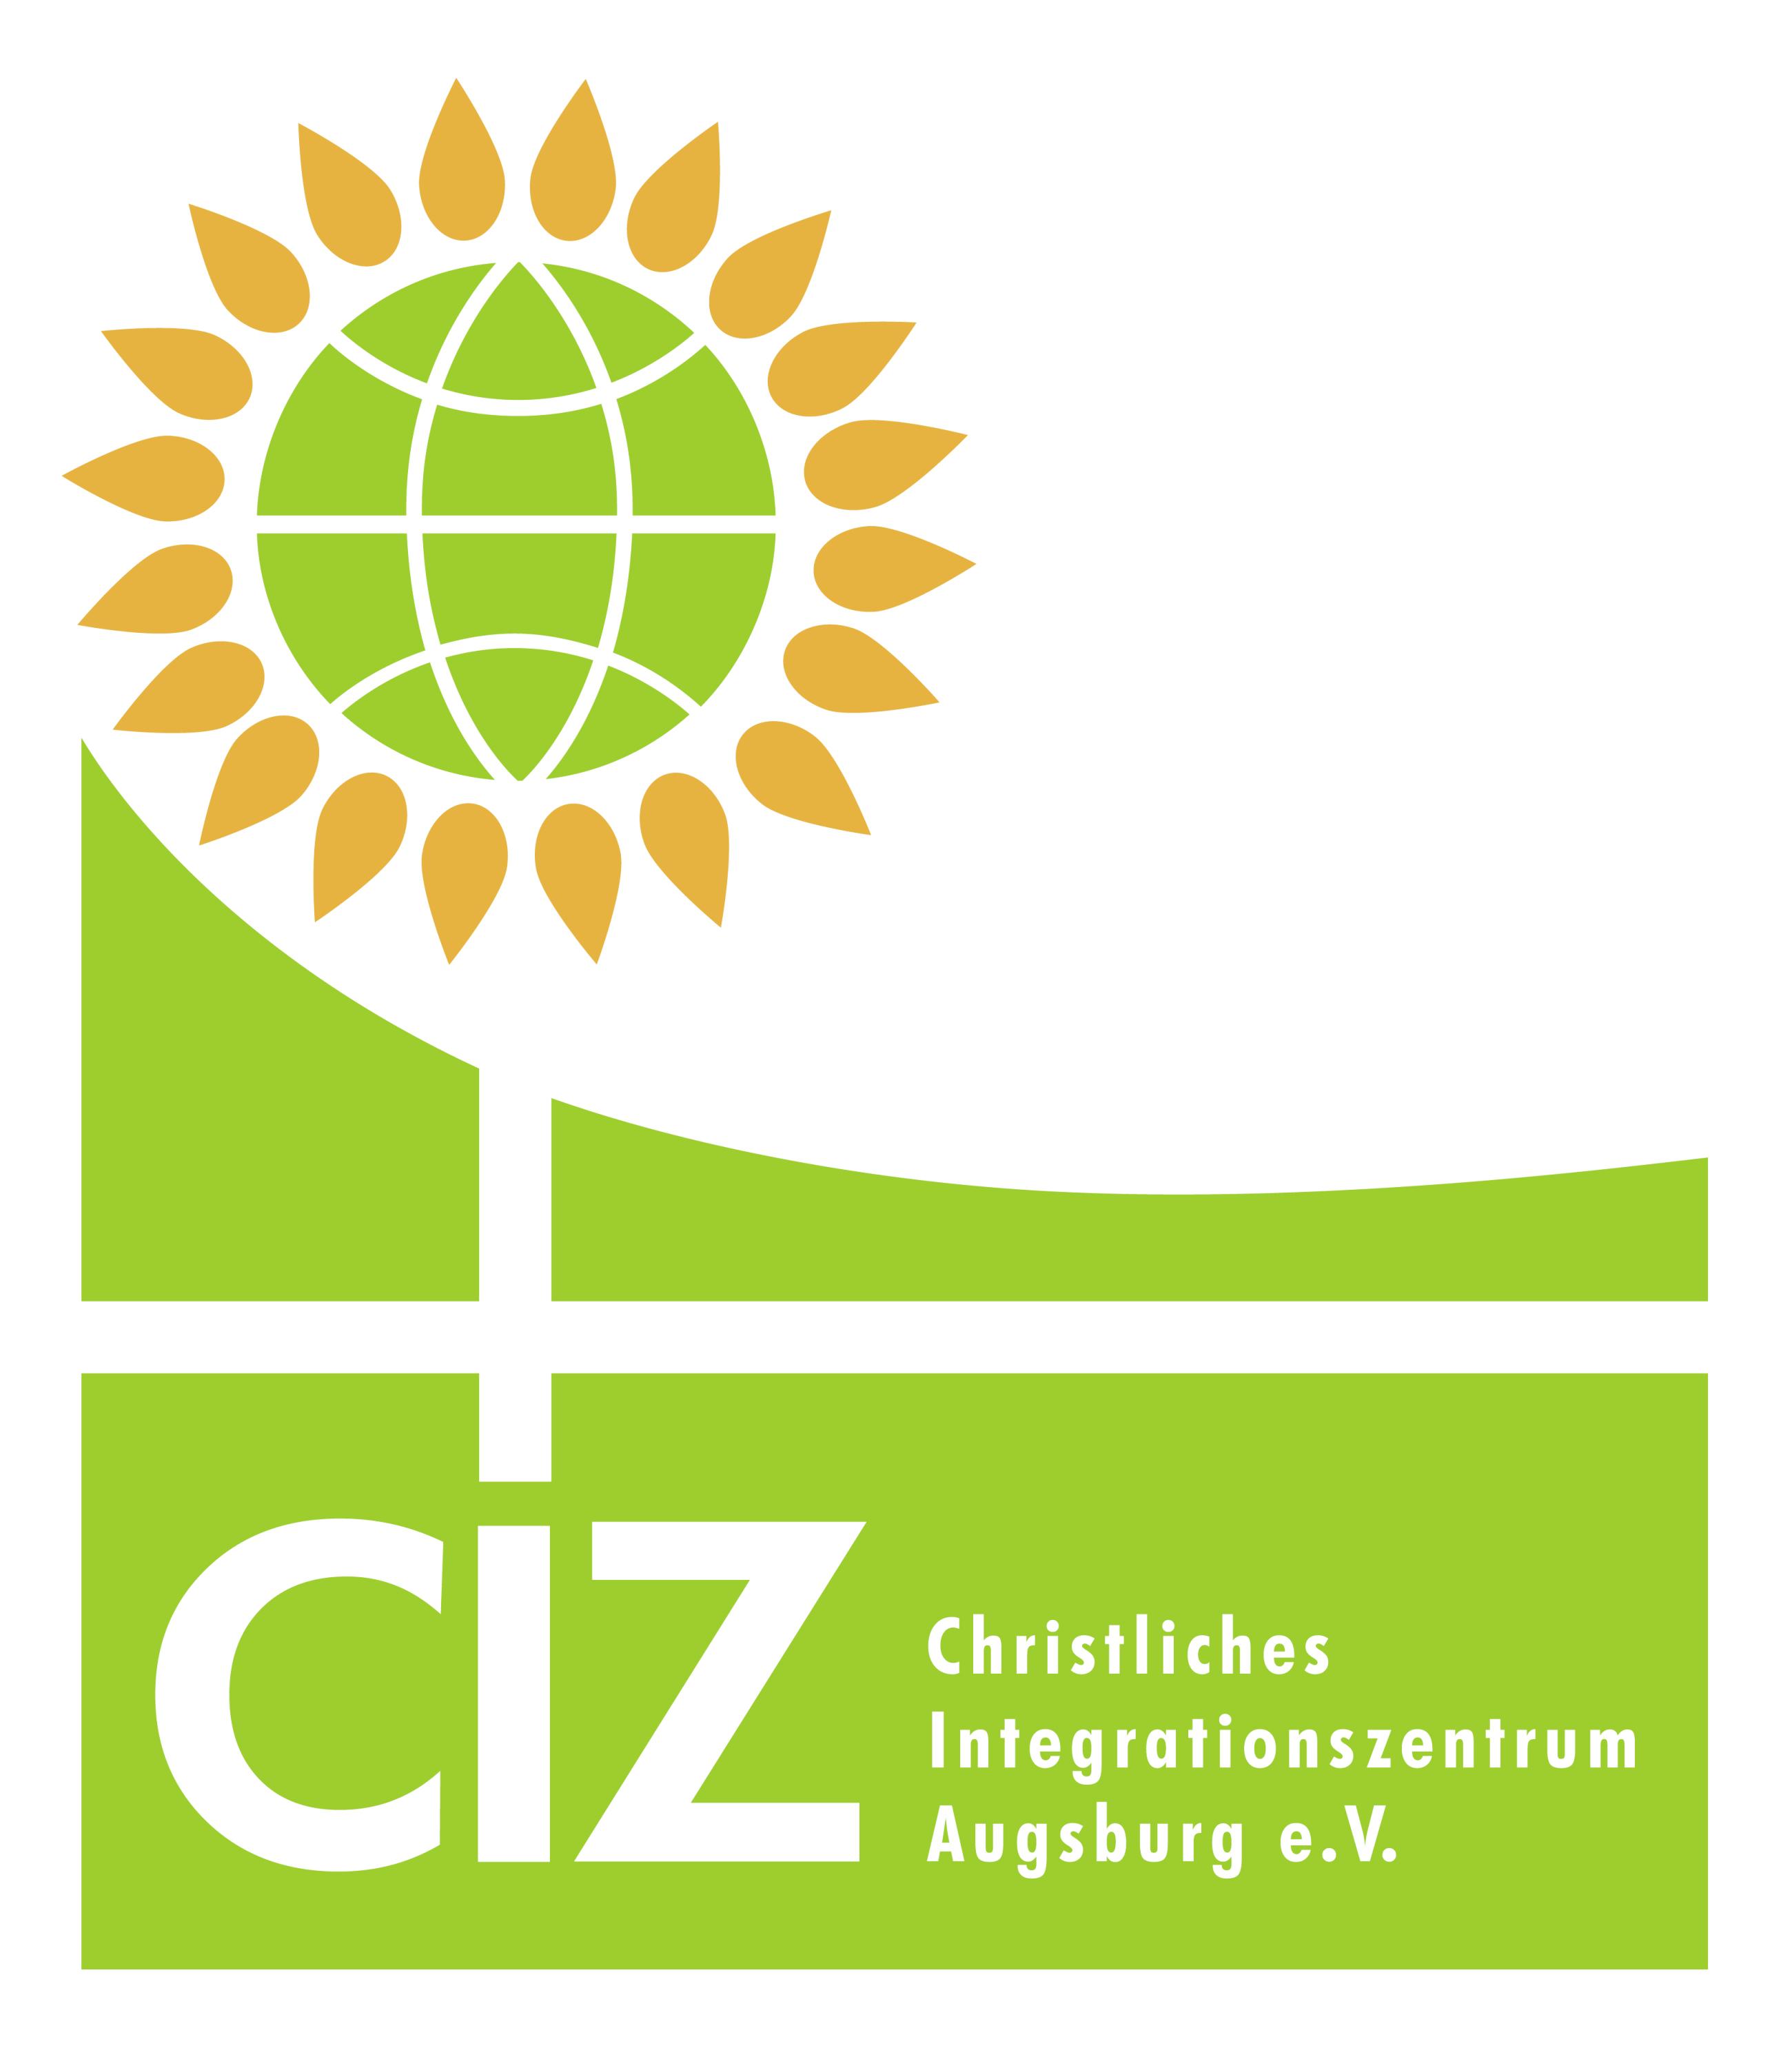 (c) Ciz-augsburg.de